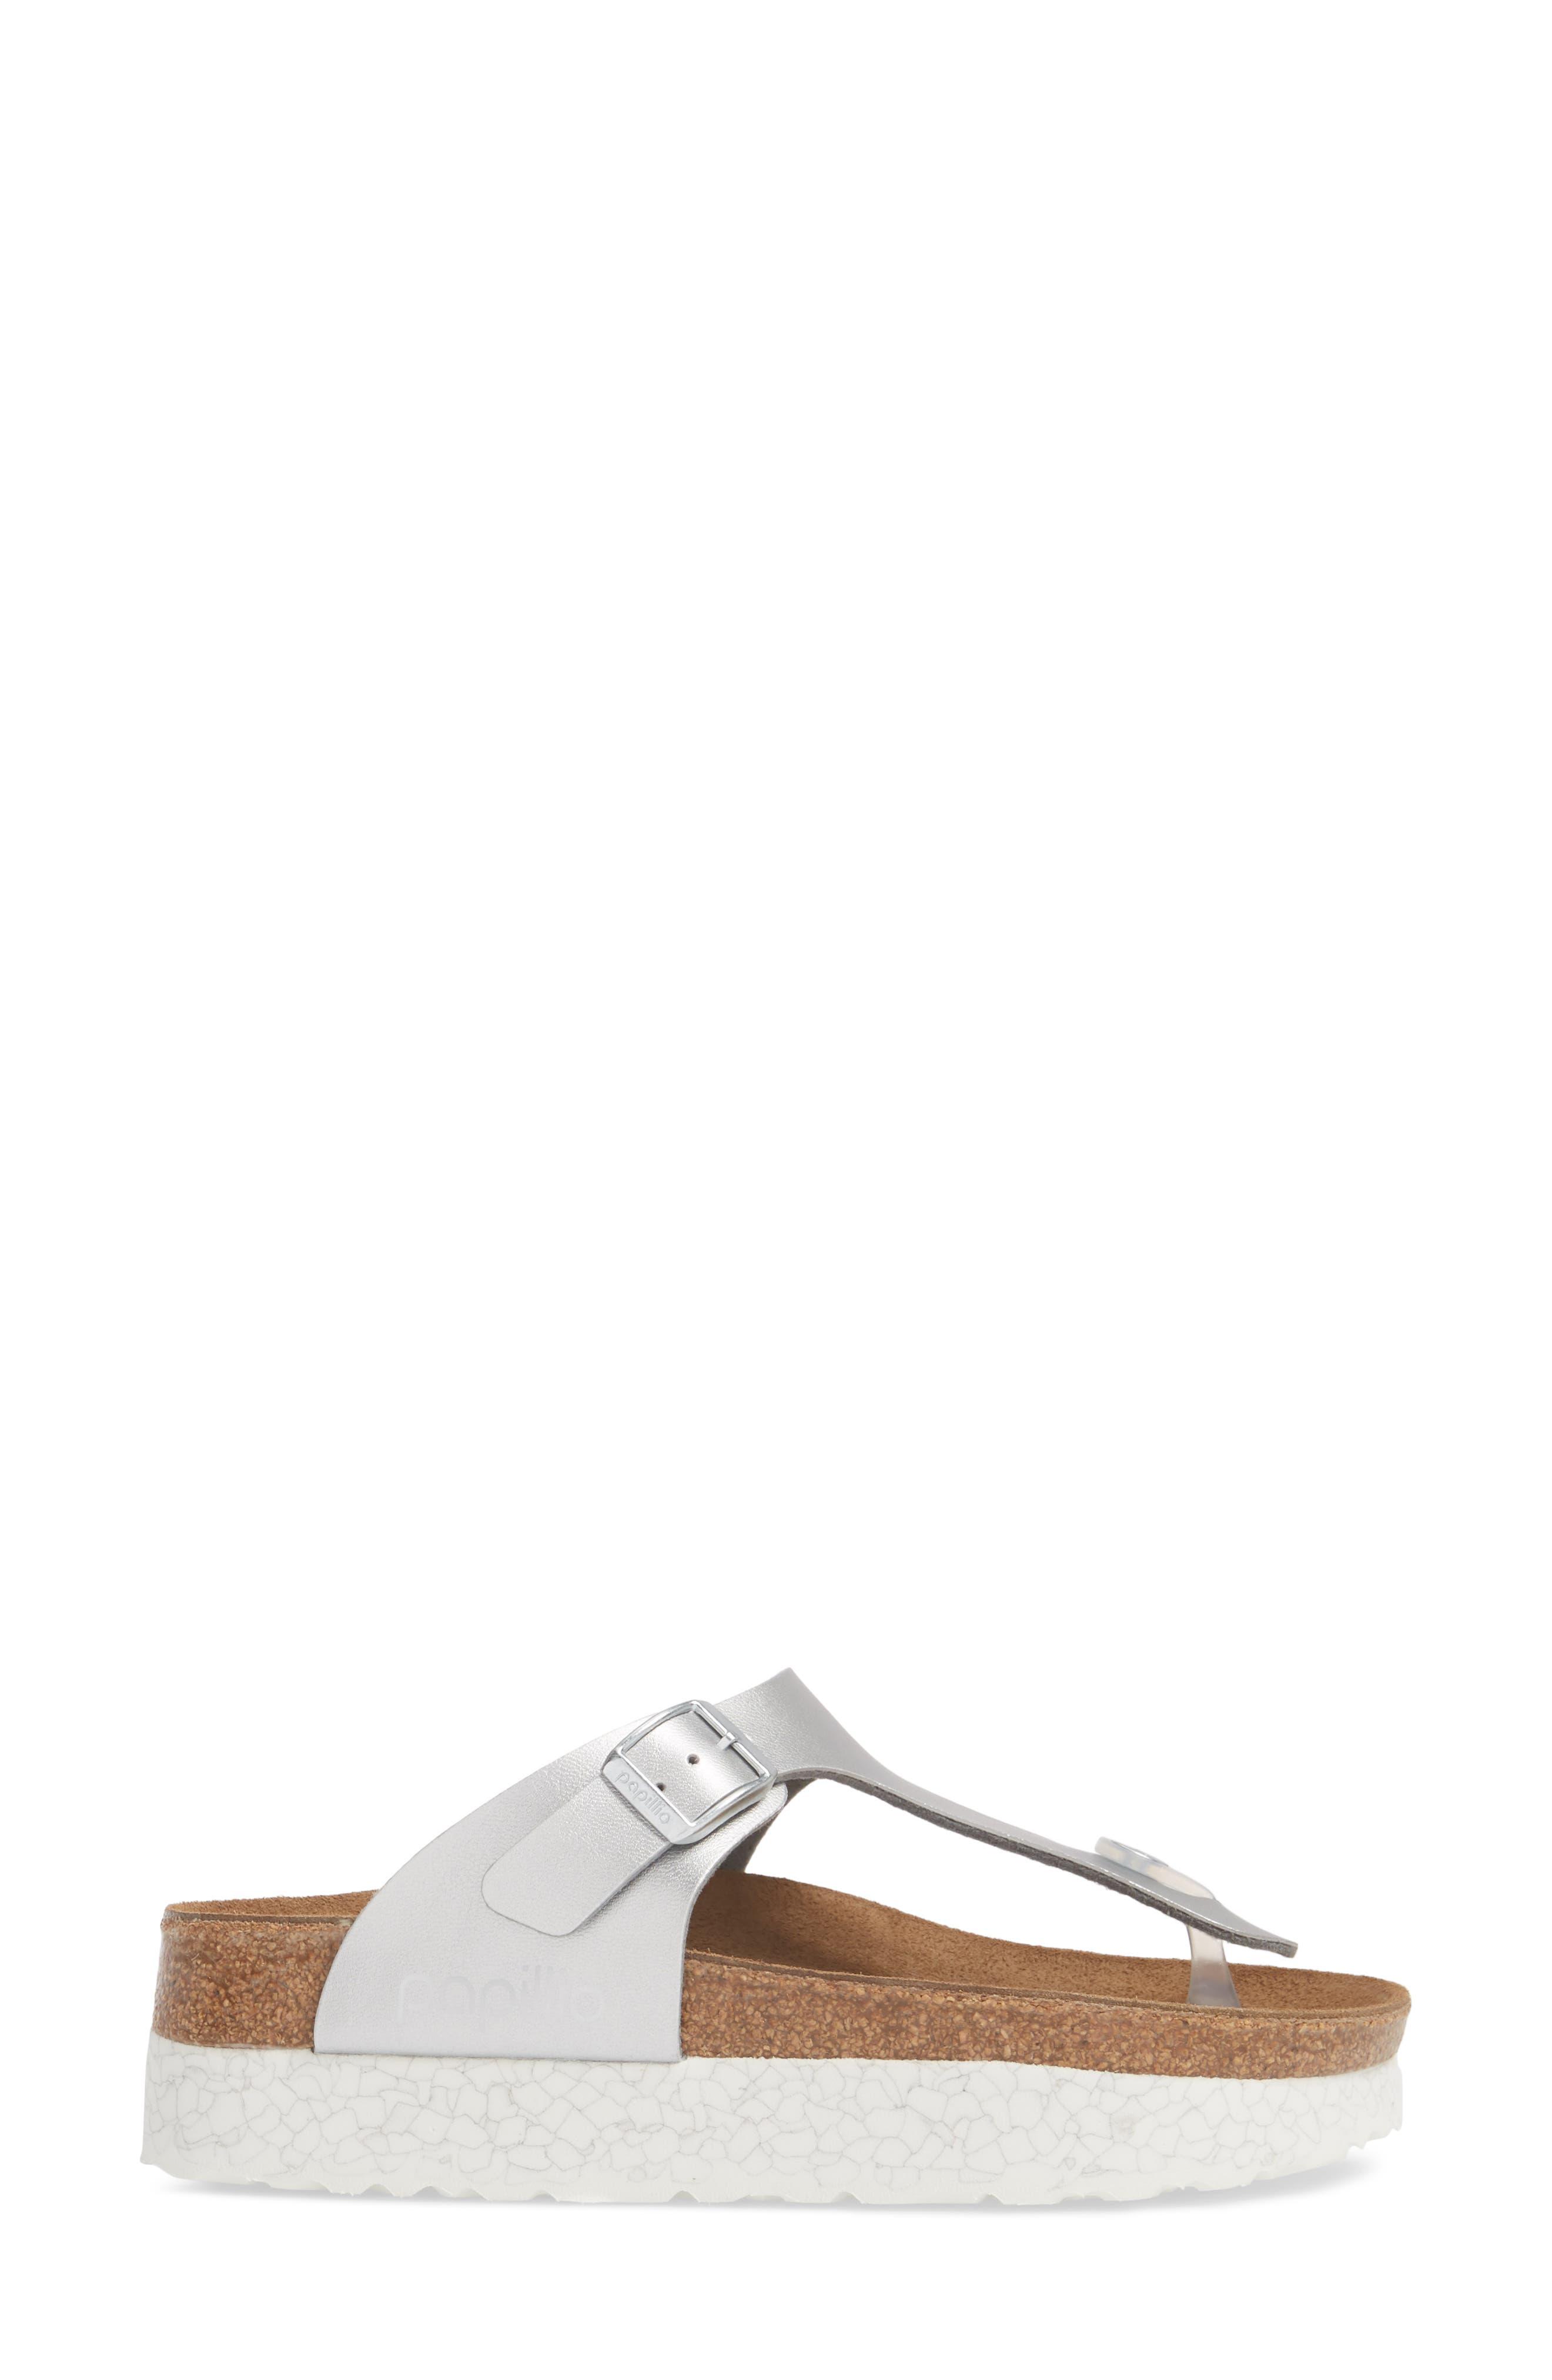 Papillio by Birkenstock 'Gizeh' Birko-Flor Platform Flip Flop Sandal,                             Alternate thumbnail 3, color,                             150